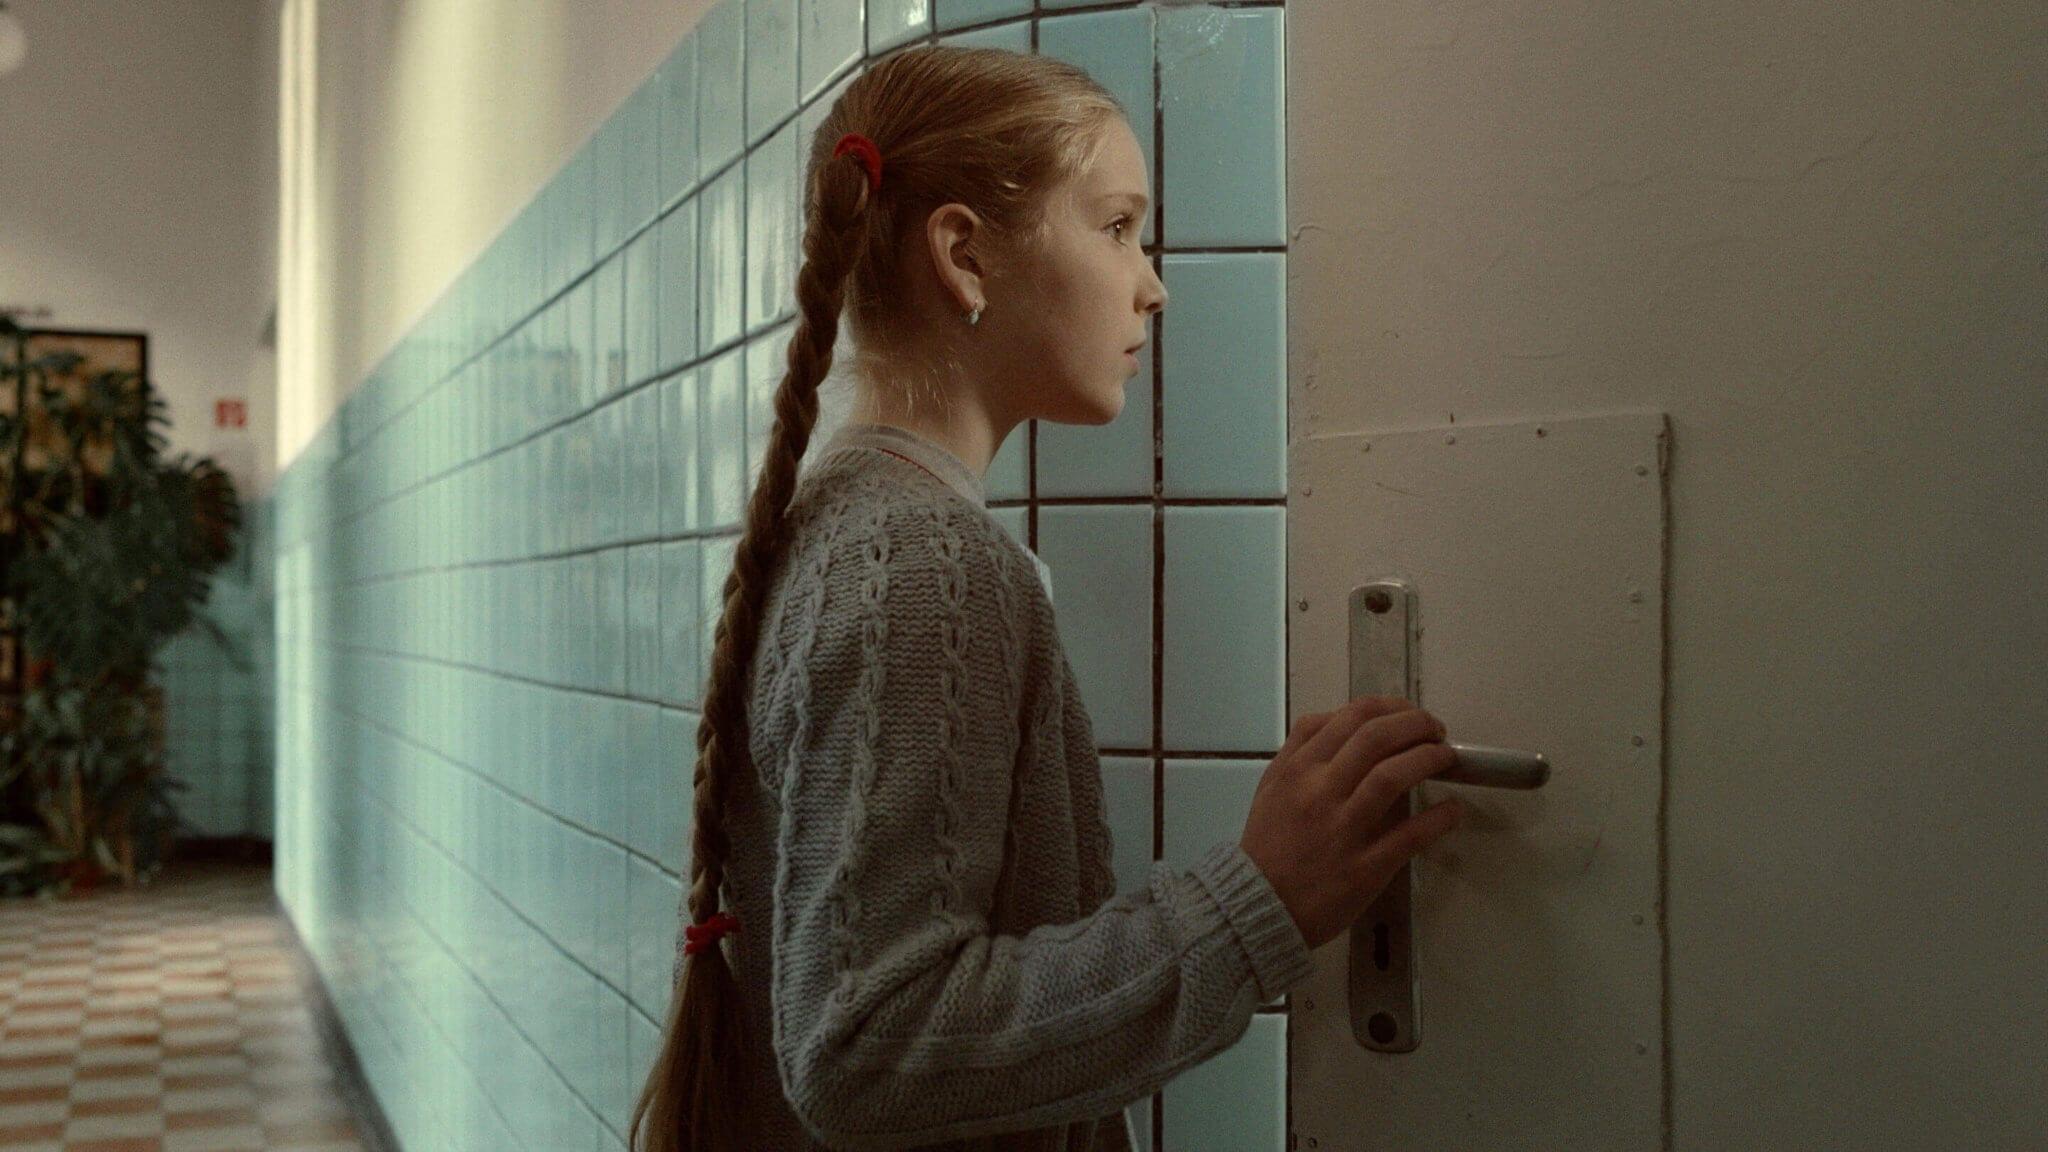 Sing (Mindenki) - Oscar Shortlisted Short Film - Review - Indie Shorts Mag 1